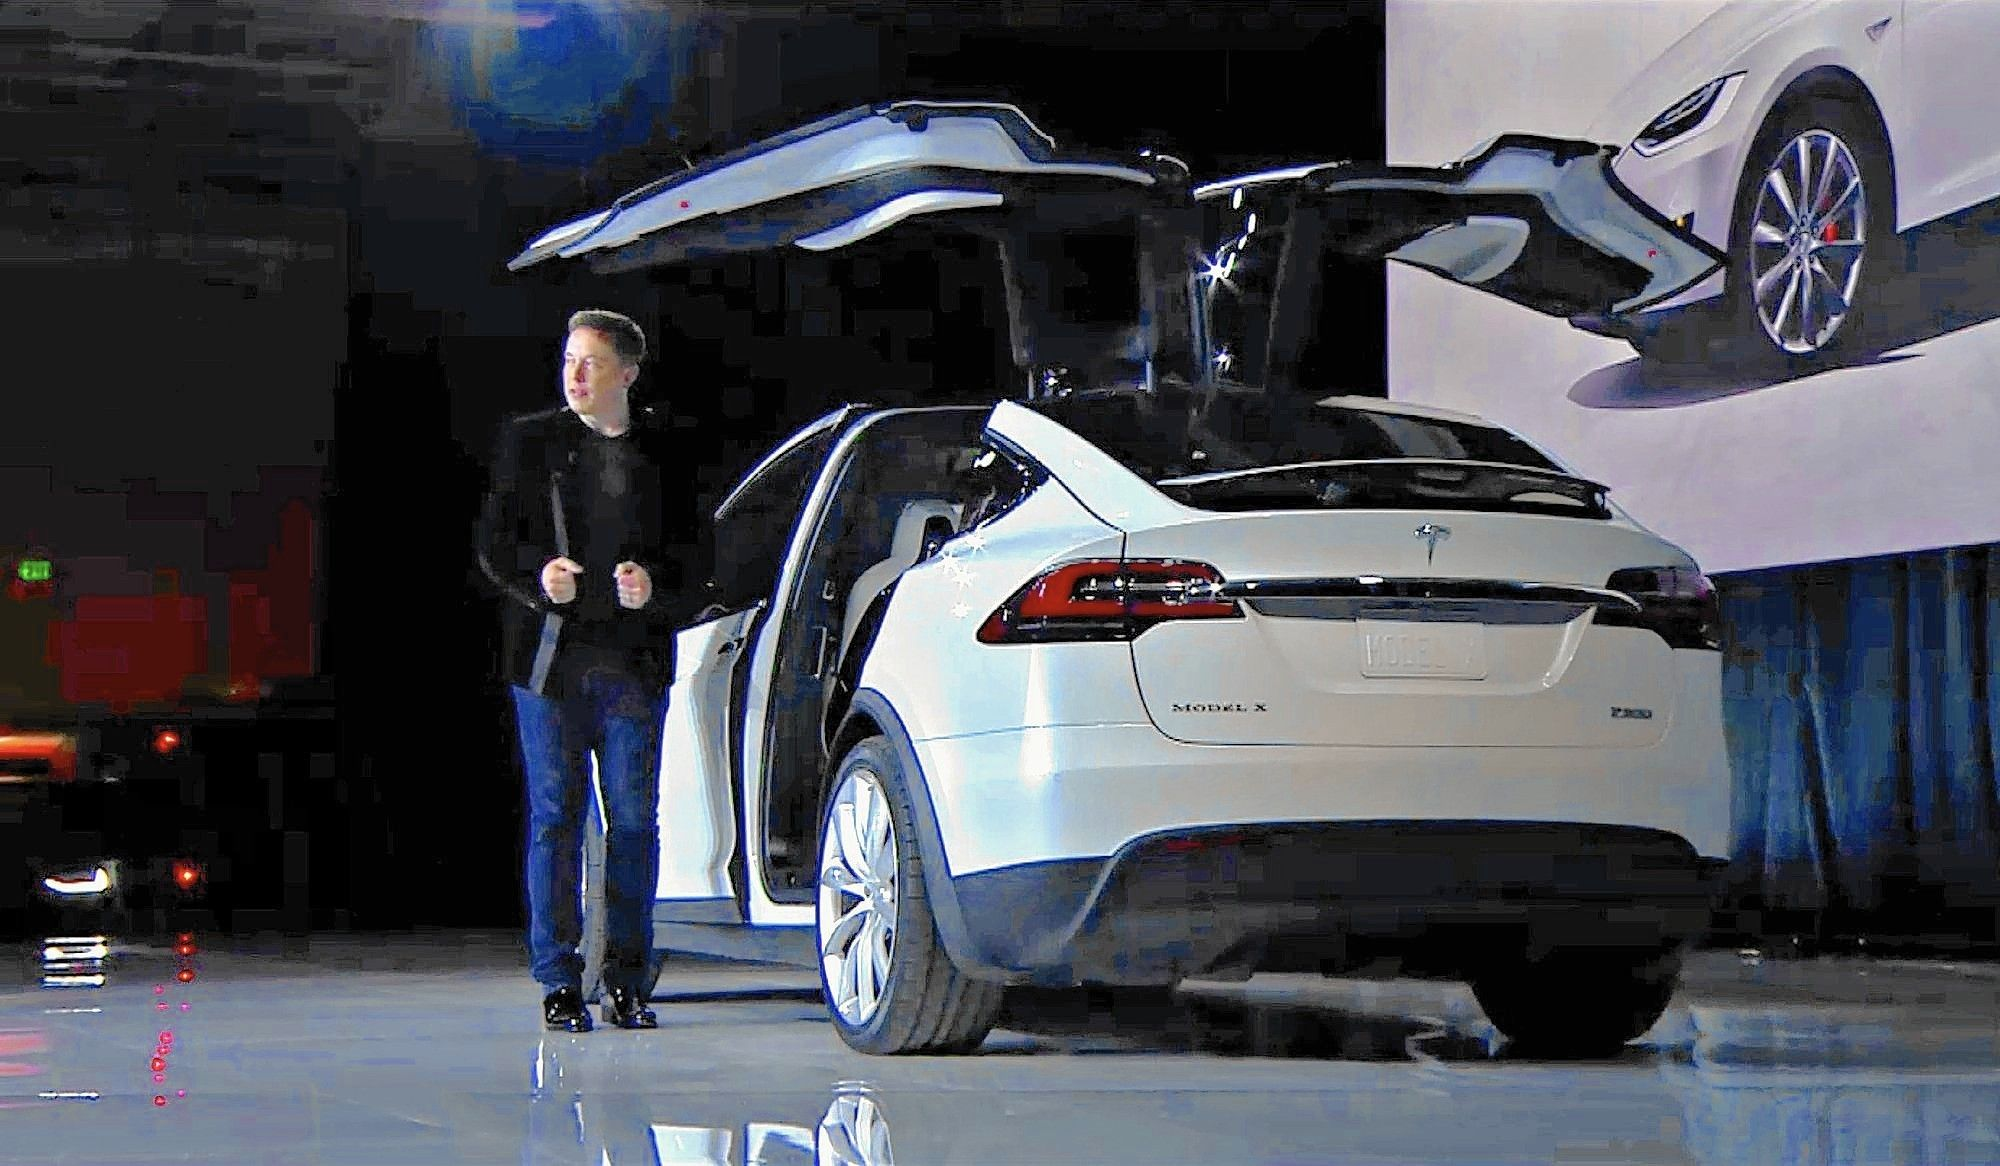 car luxury tax california  California State Treasurer John Chiang announced Tuesday that ...